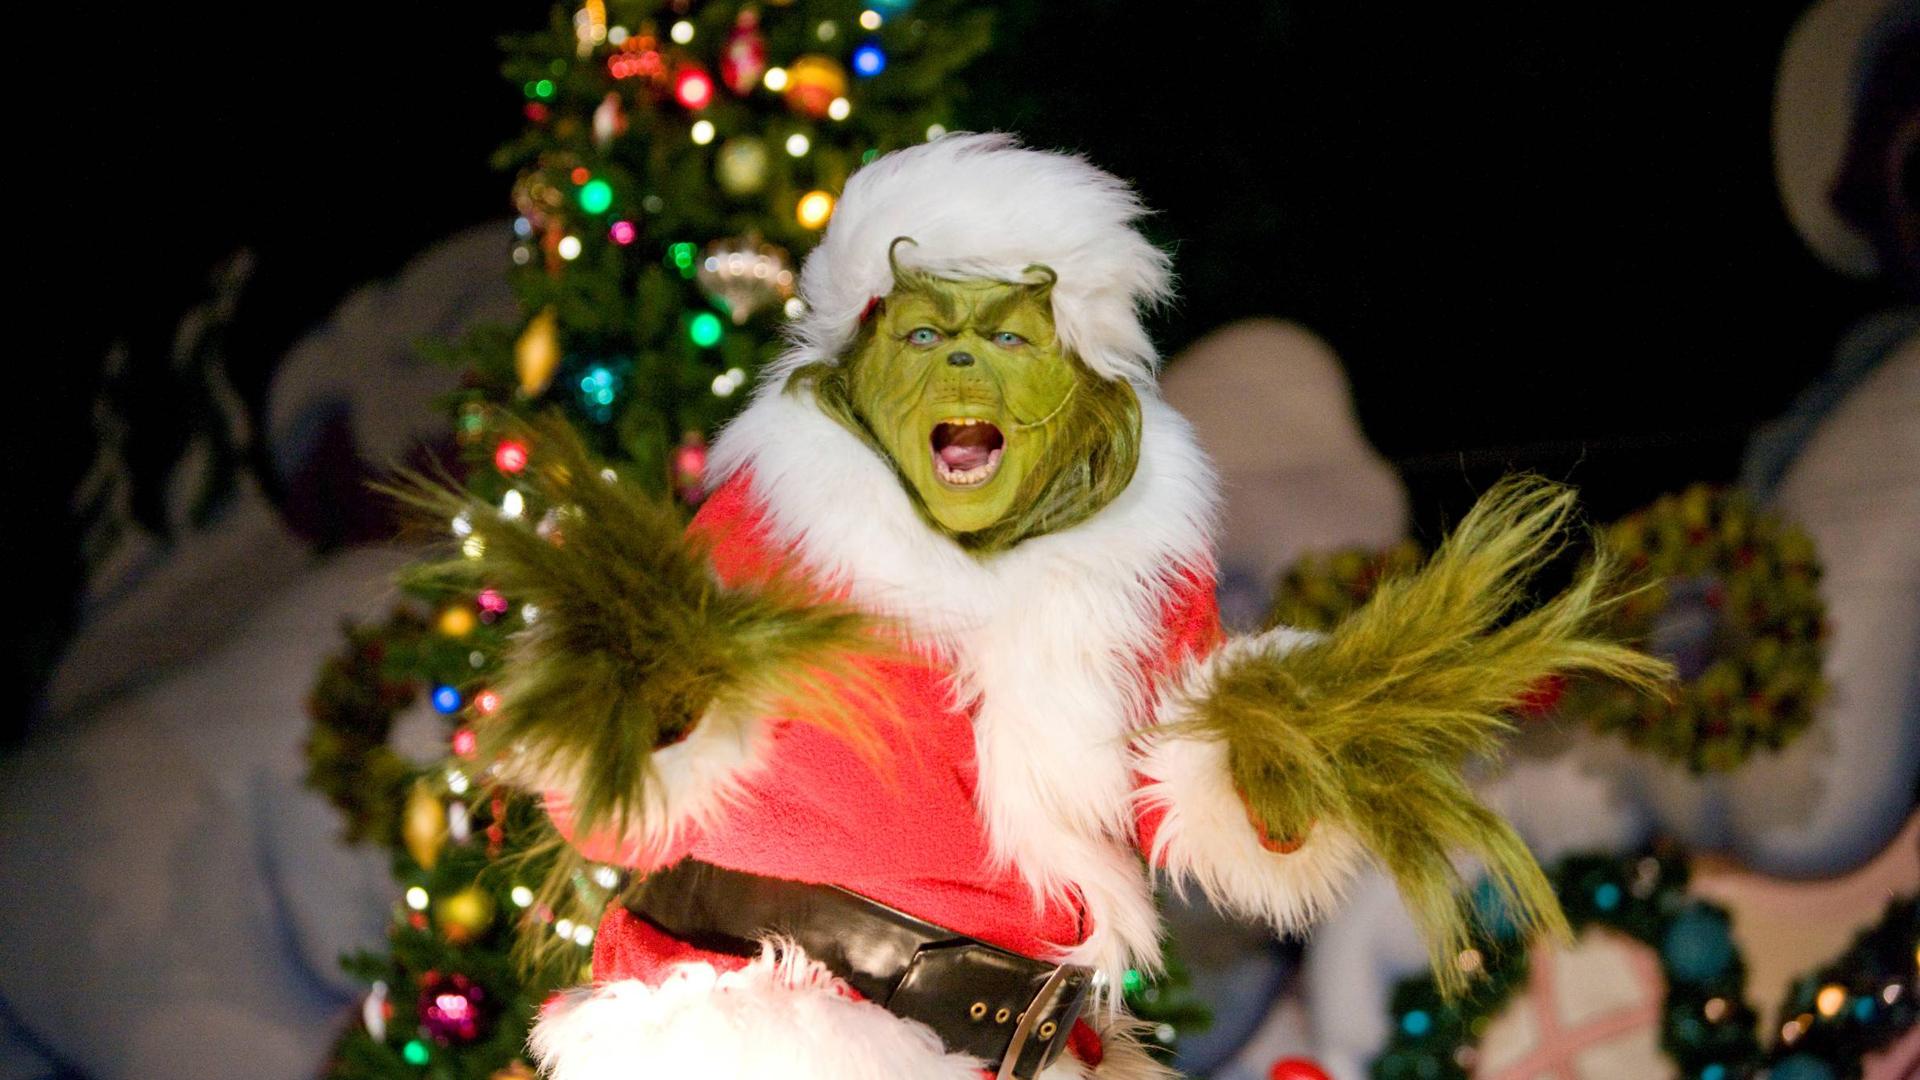 download Grinch Full HD Wallpaper Christmas 1080p 1920x1080